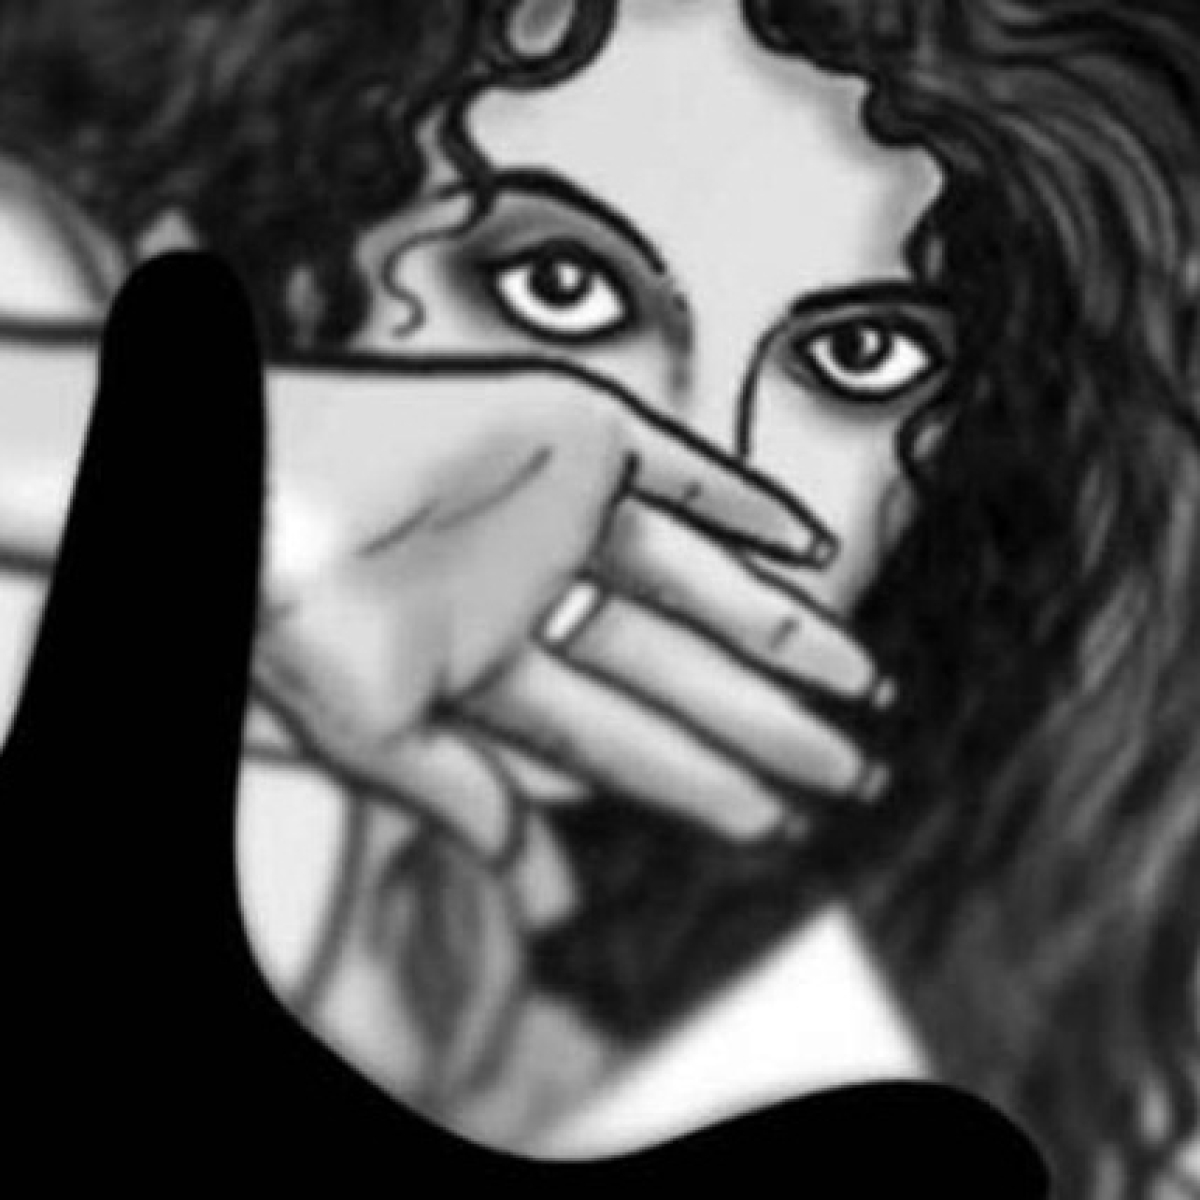 Mumbai Crime: 6-year-old girl raped by man inside school washroom